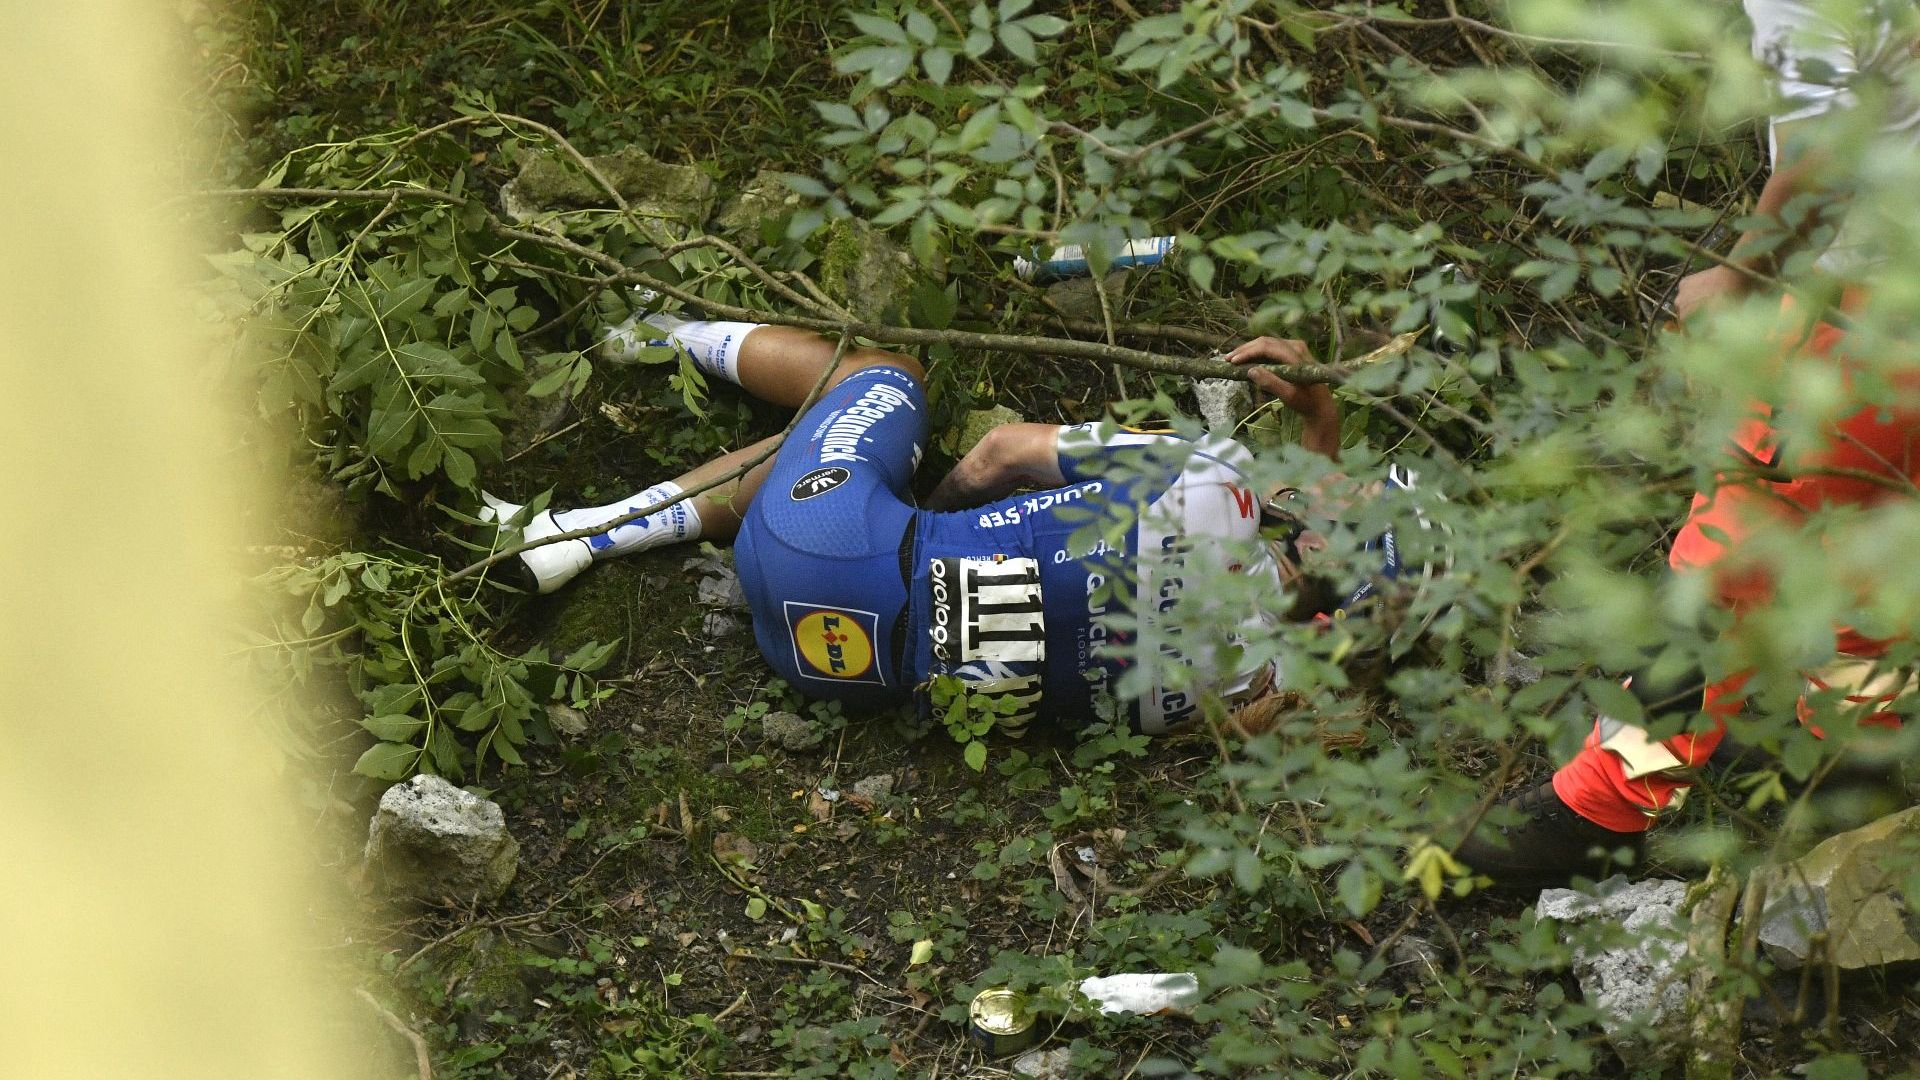 Фрактура на таза и куп травми за Евенпул, автомобил блъсна негов колега